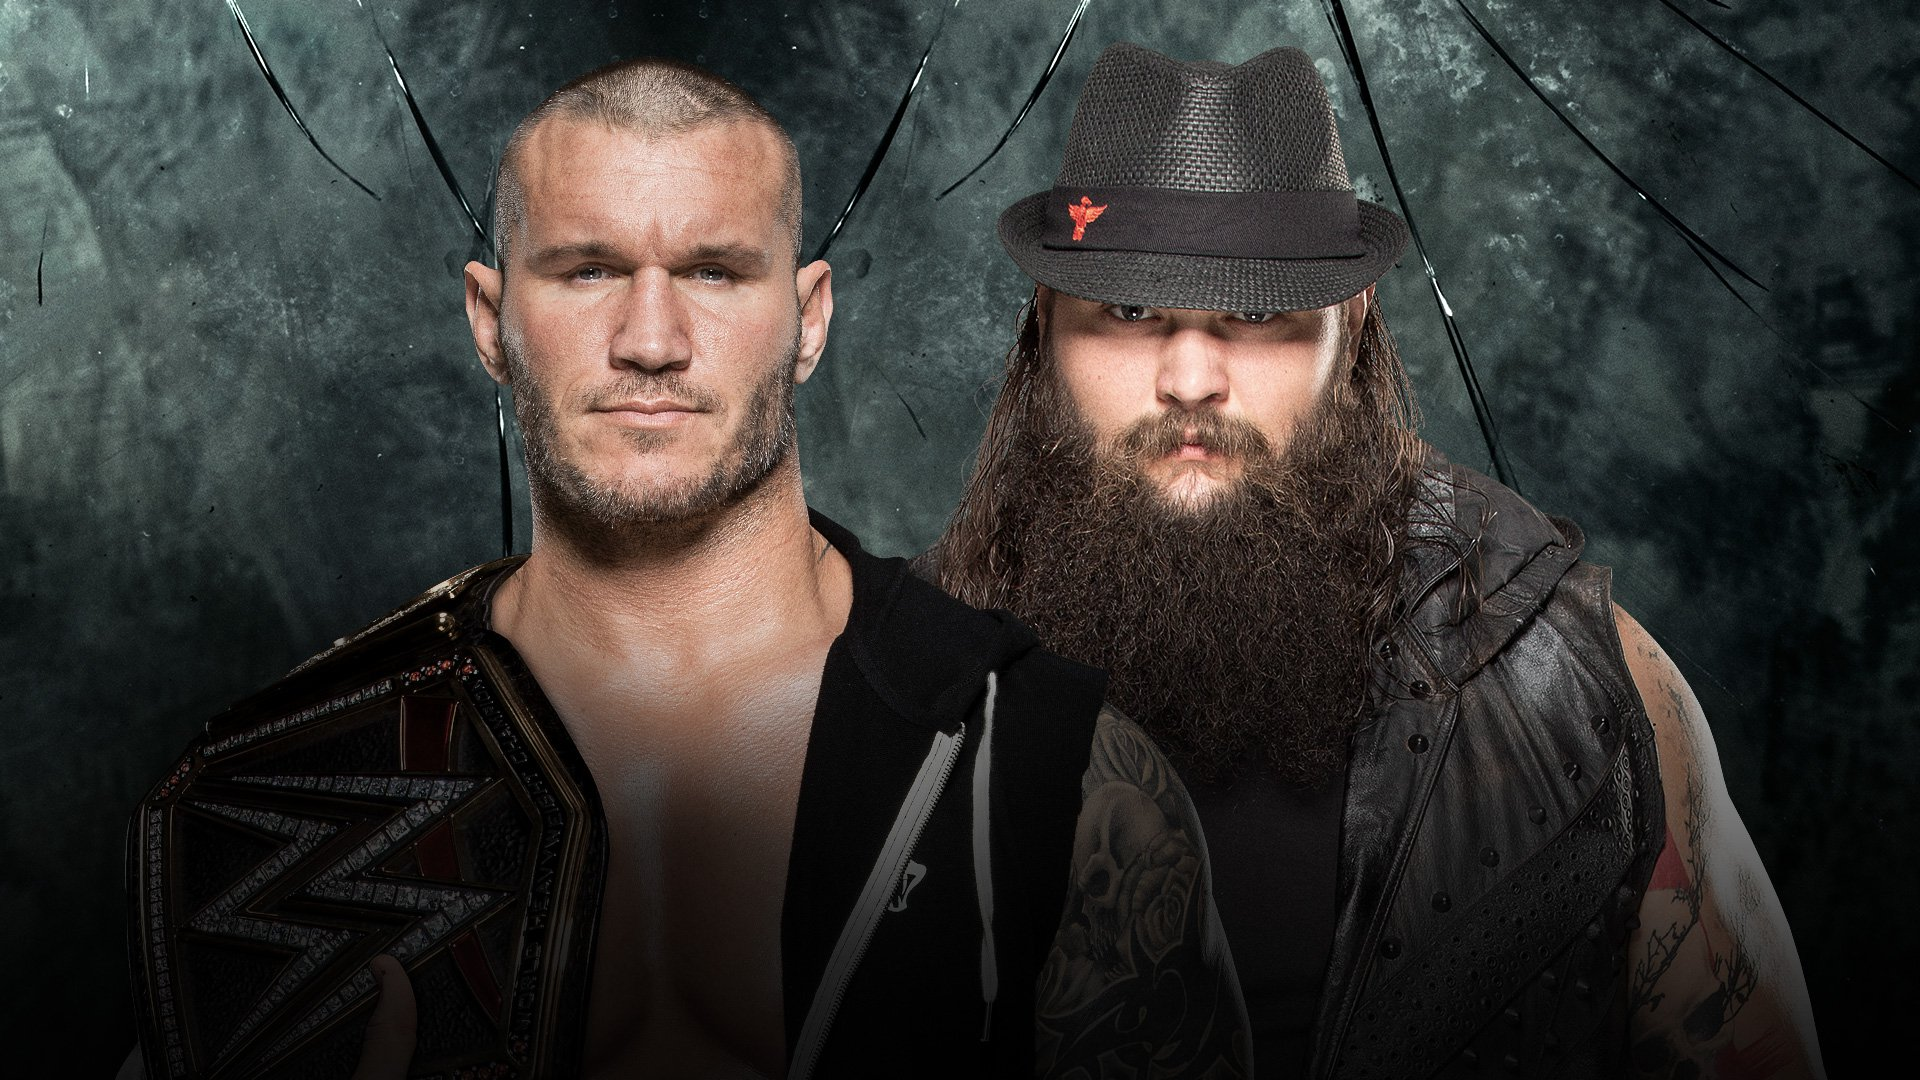 WWE Payback 2017: Randy Orton vs. Bray Wyatt